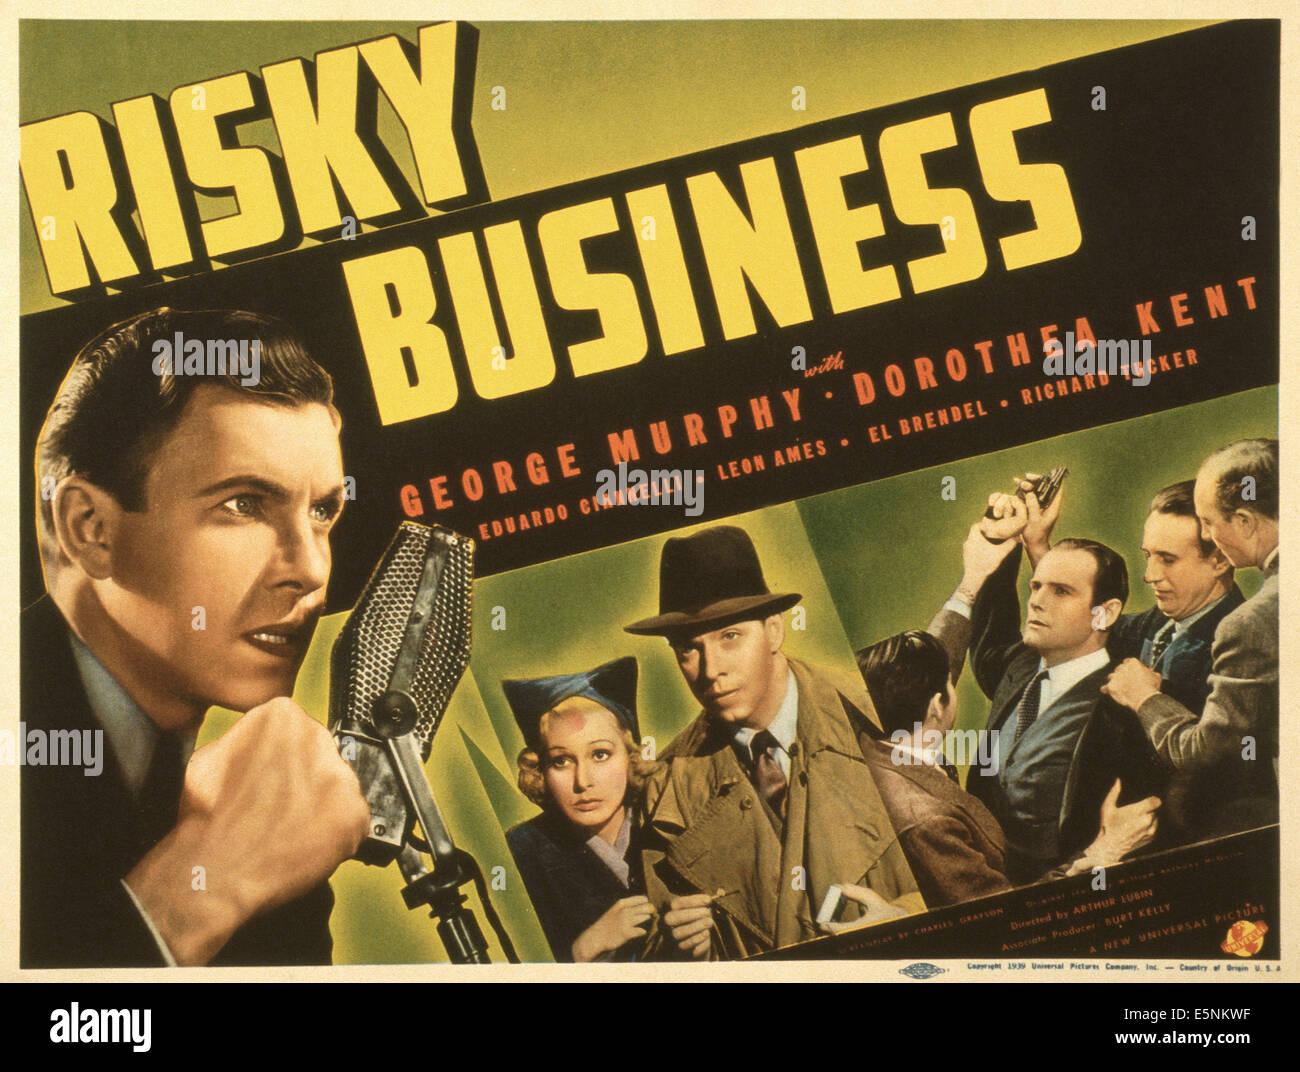 risky business stock photos